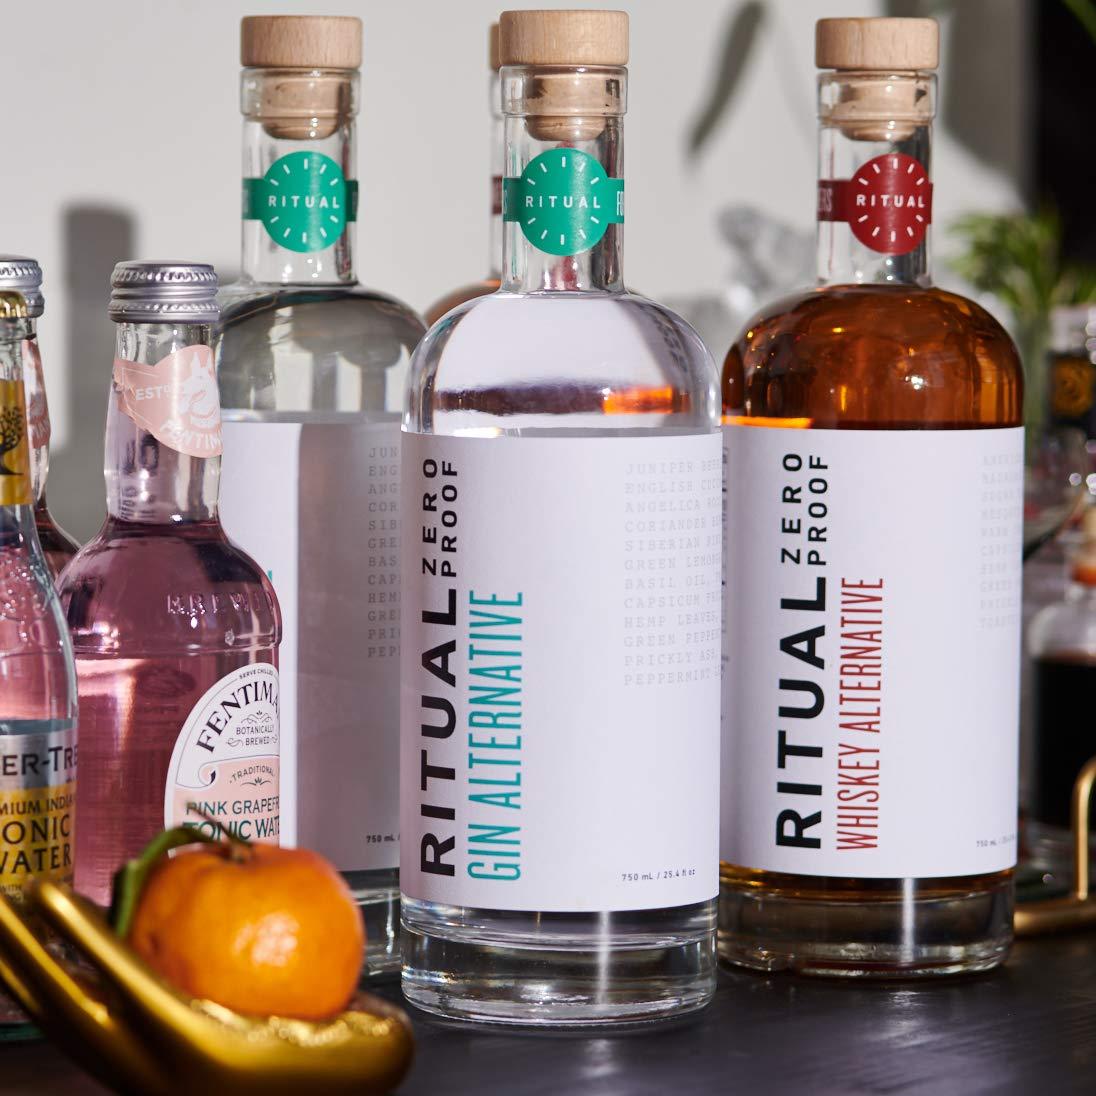 Ritual Gin – A zero-proof non alcoholic gin alternative